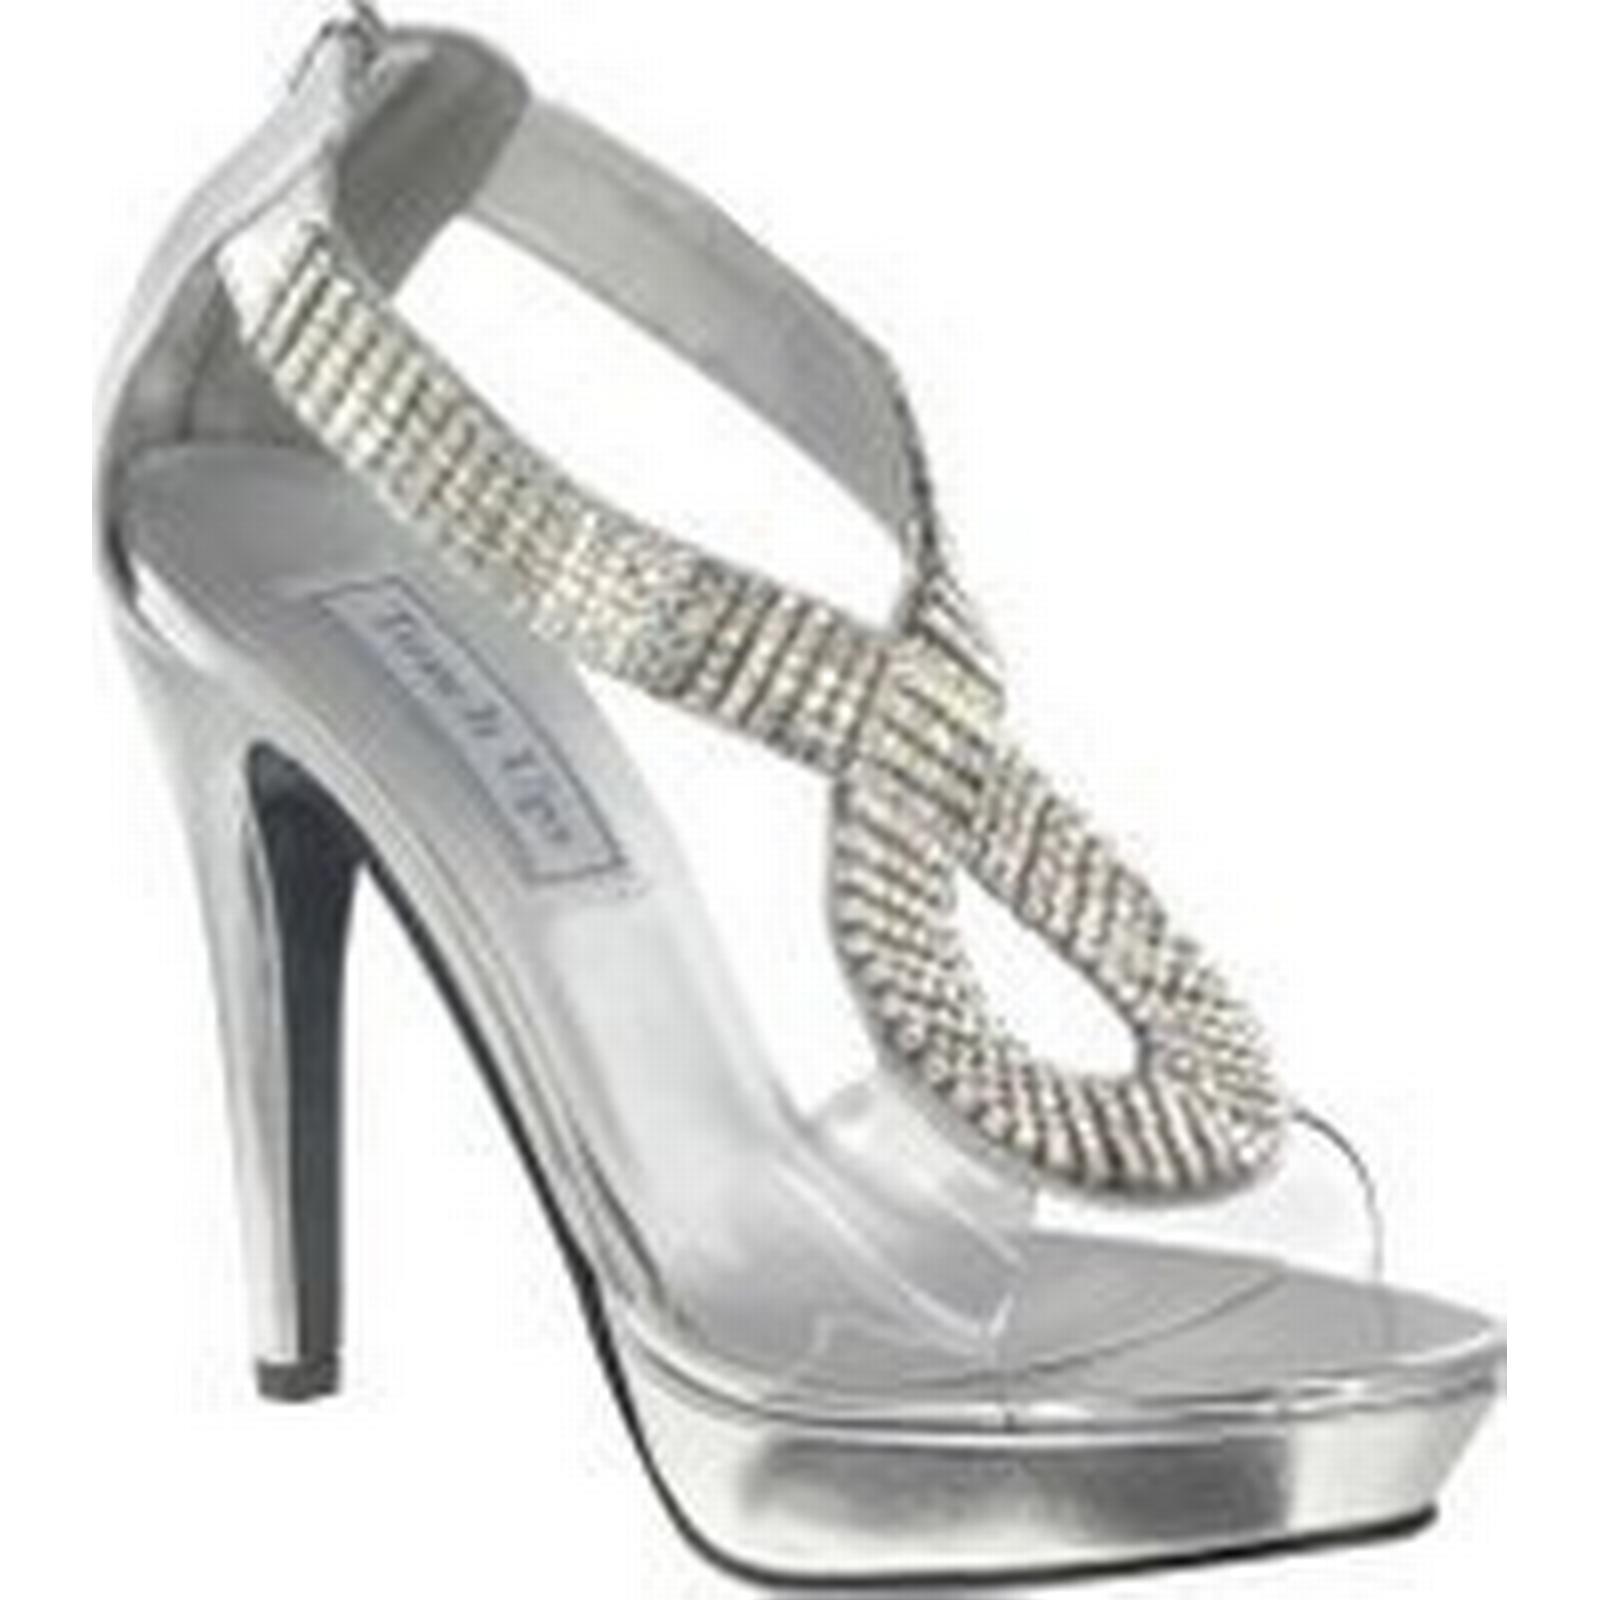 Bonanza (Global) Silver Silver Silver Clear Rhinestone Serena Pageant Prom High Heel Platform Sandal Shoe cec383